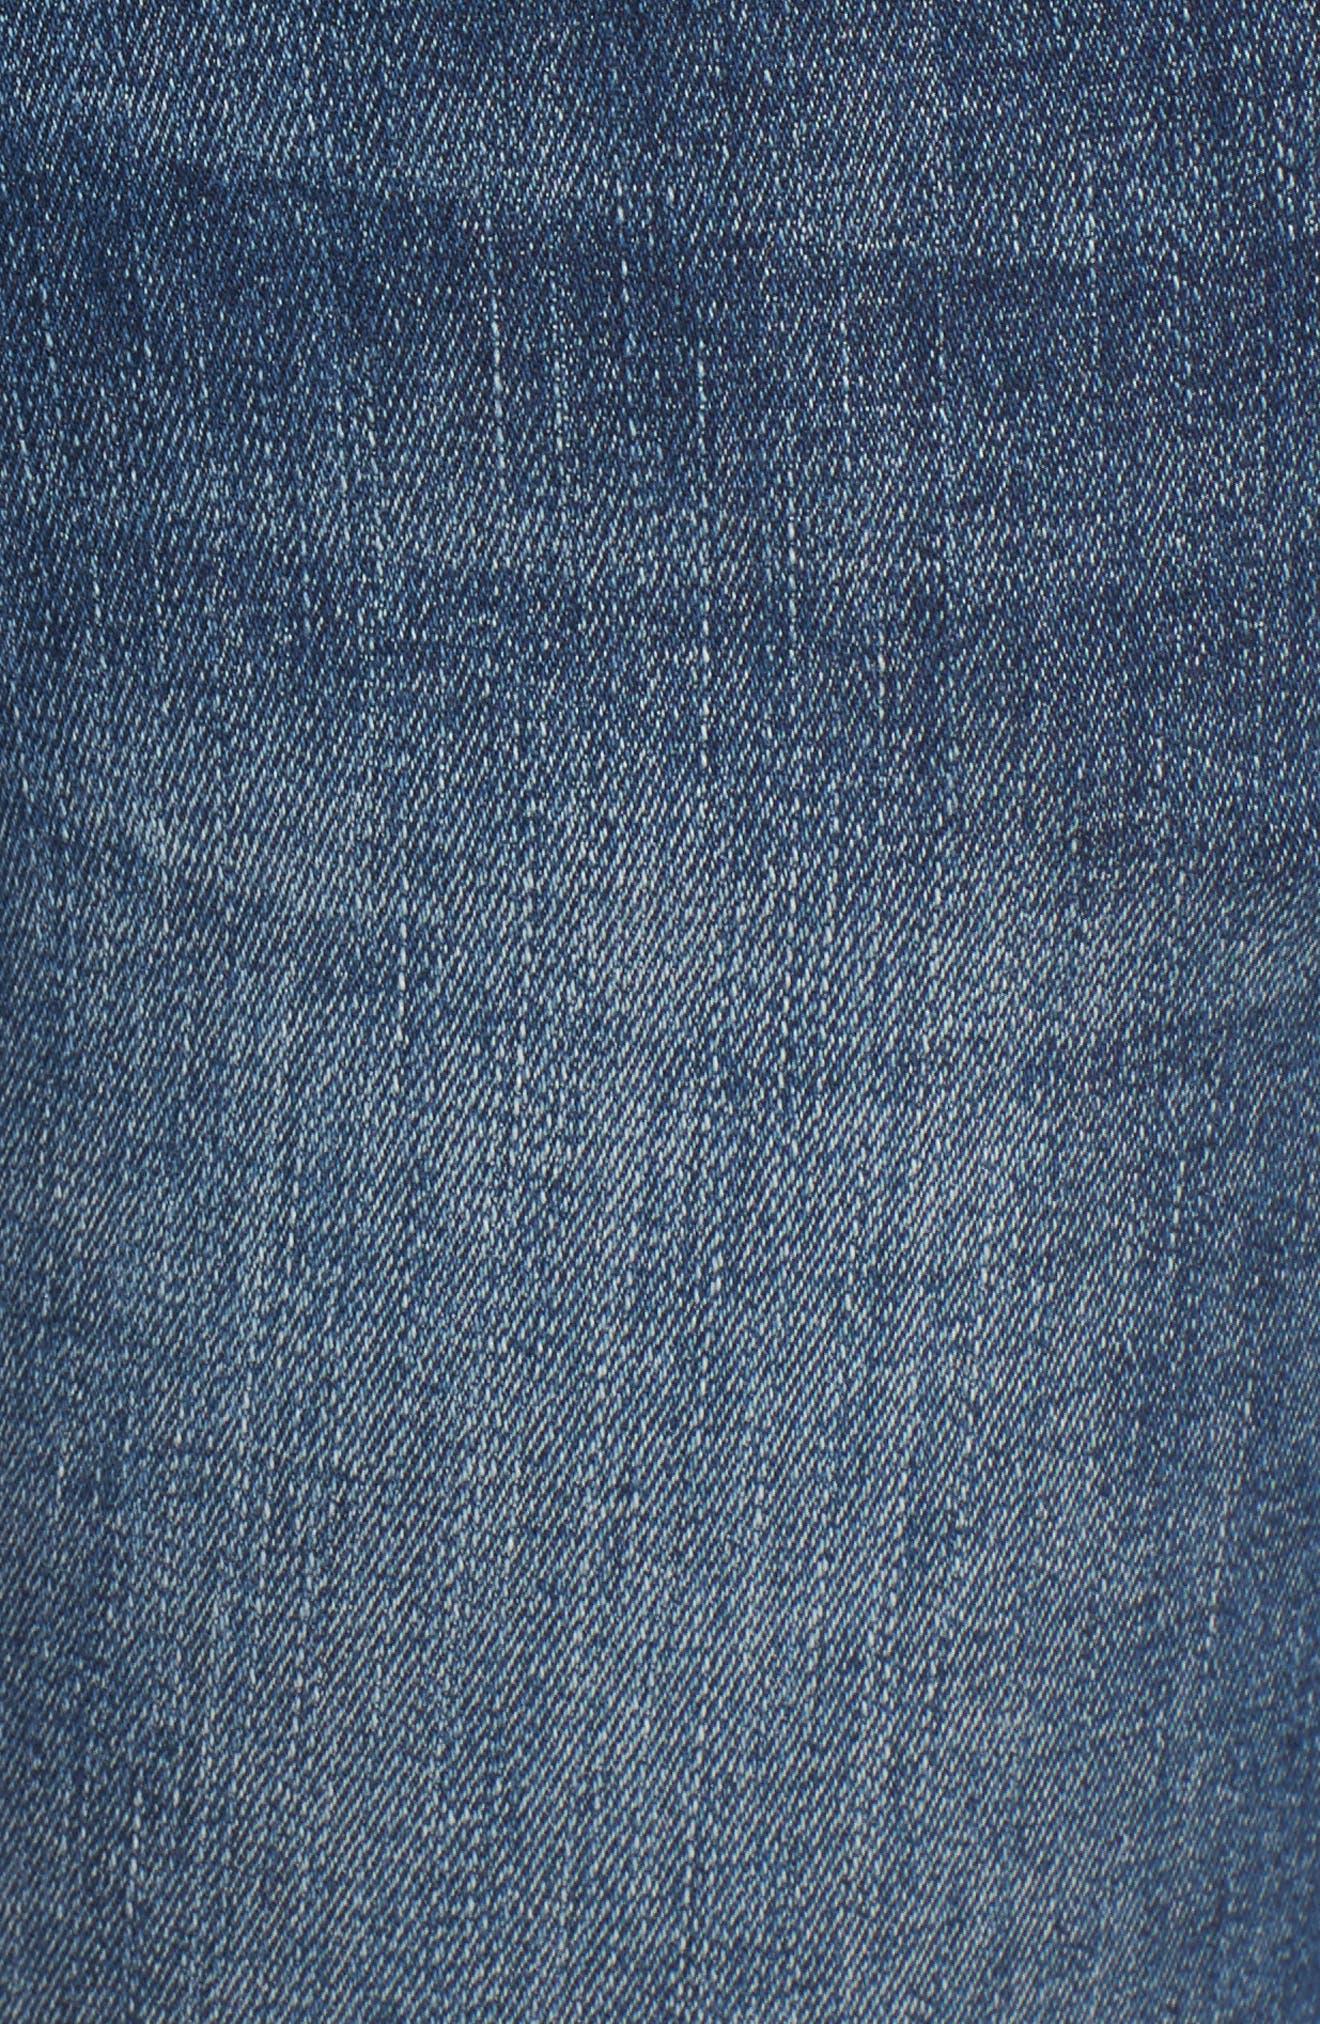 Florence Instasculpt Crop Skinny Jeans,                             Alternate thumbnail 6, color,                             EVERGLADE